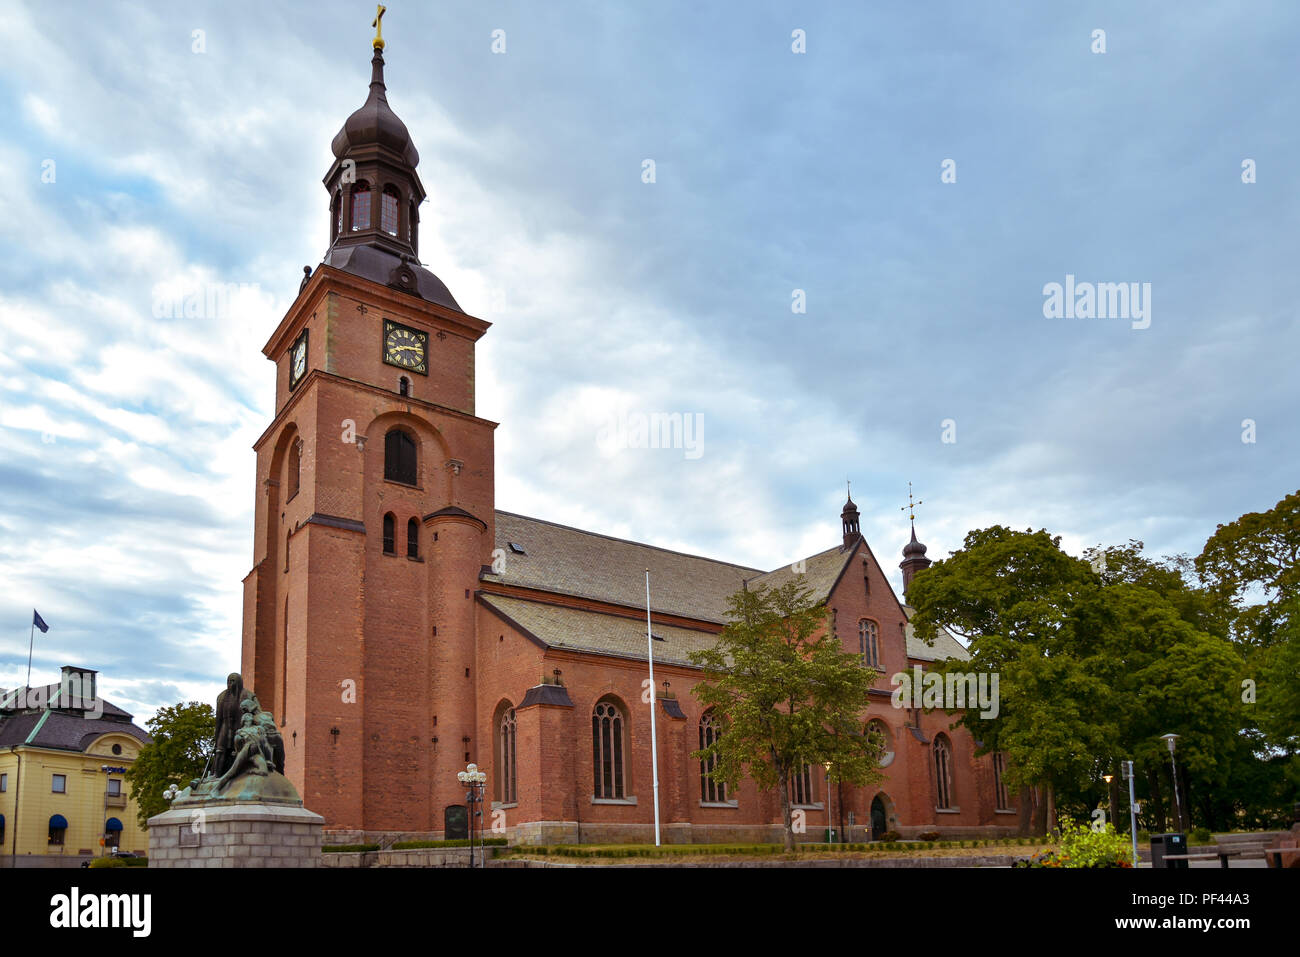 Falu kommun: Byggnader i Falu kommun, Faluns garnison